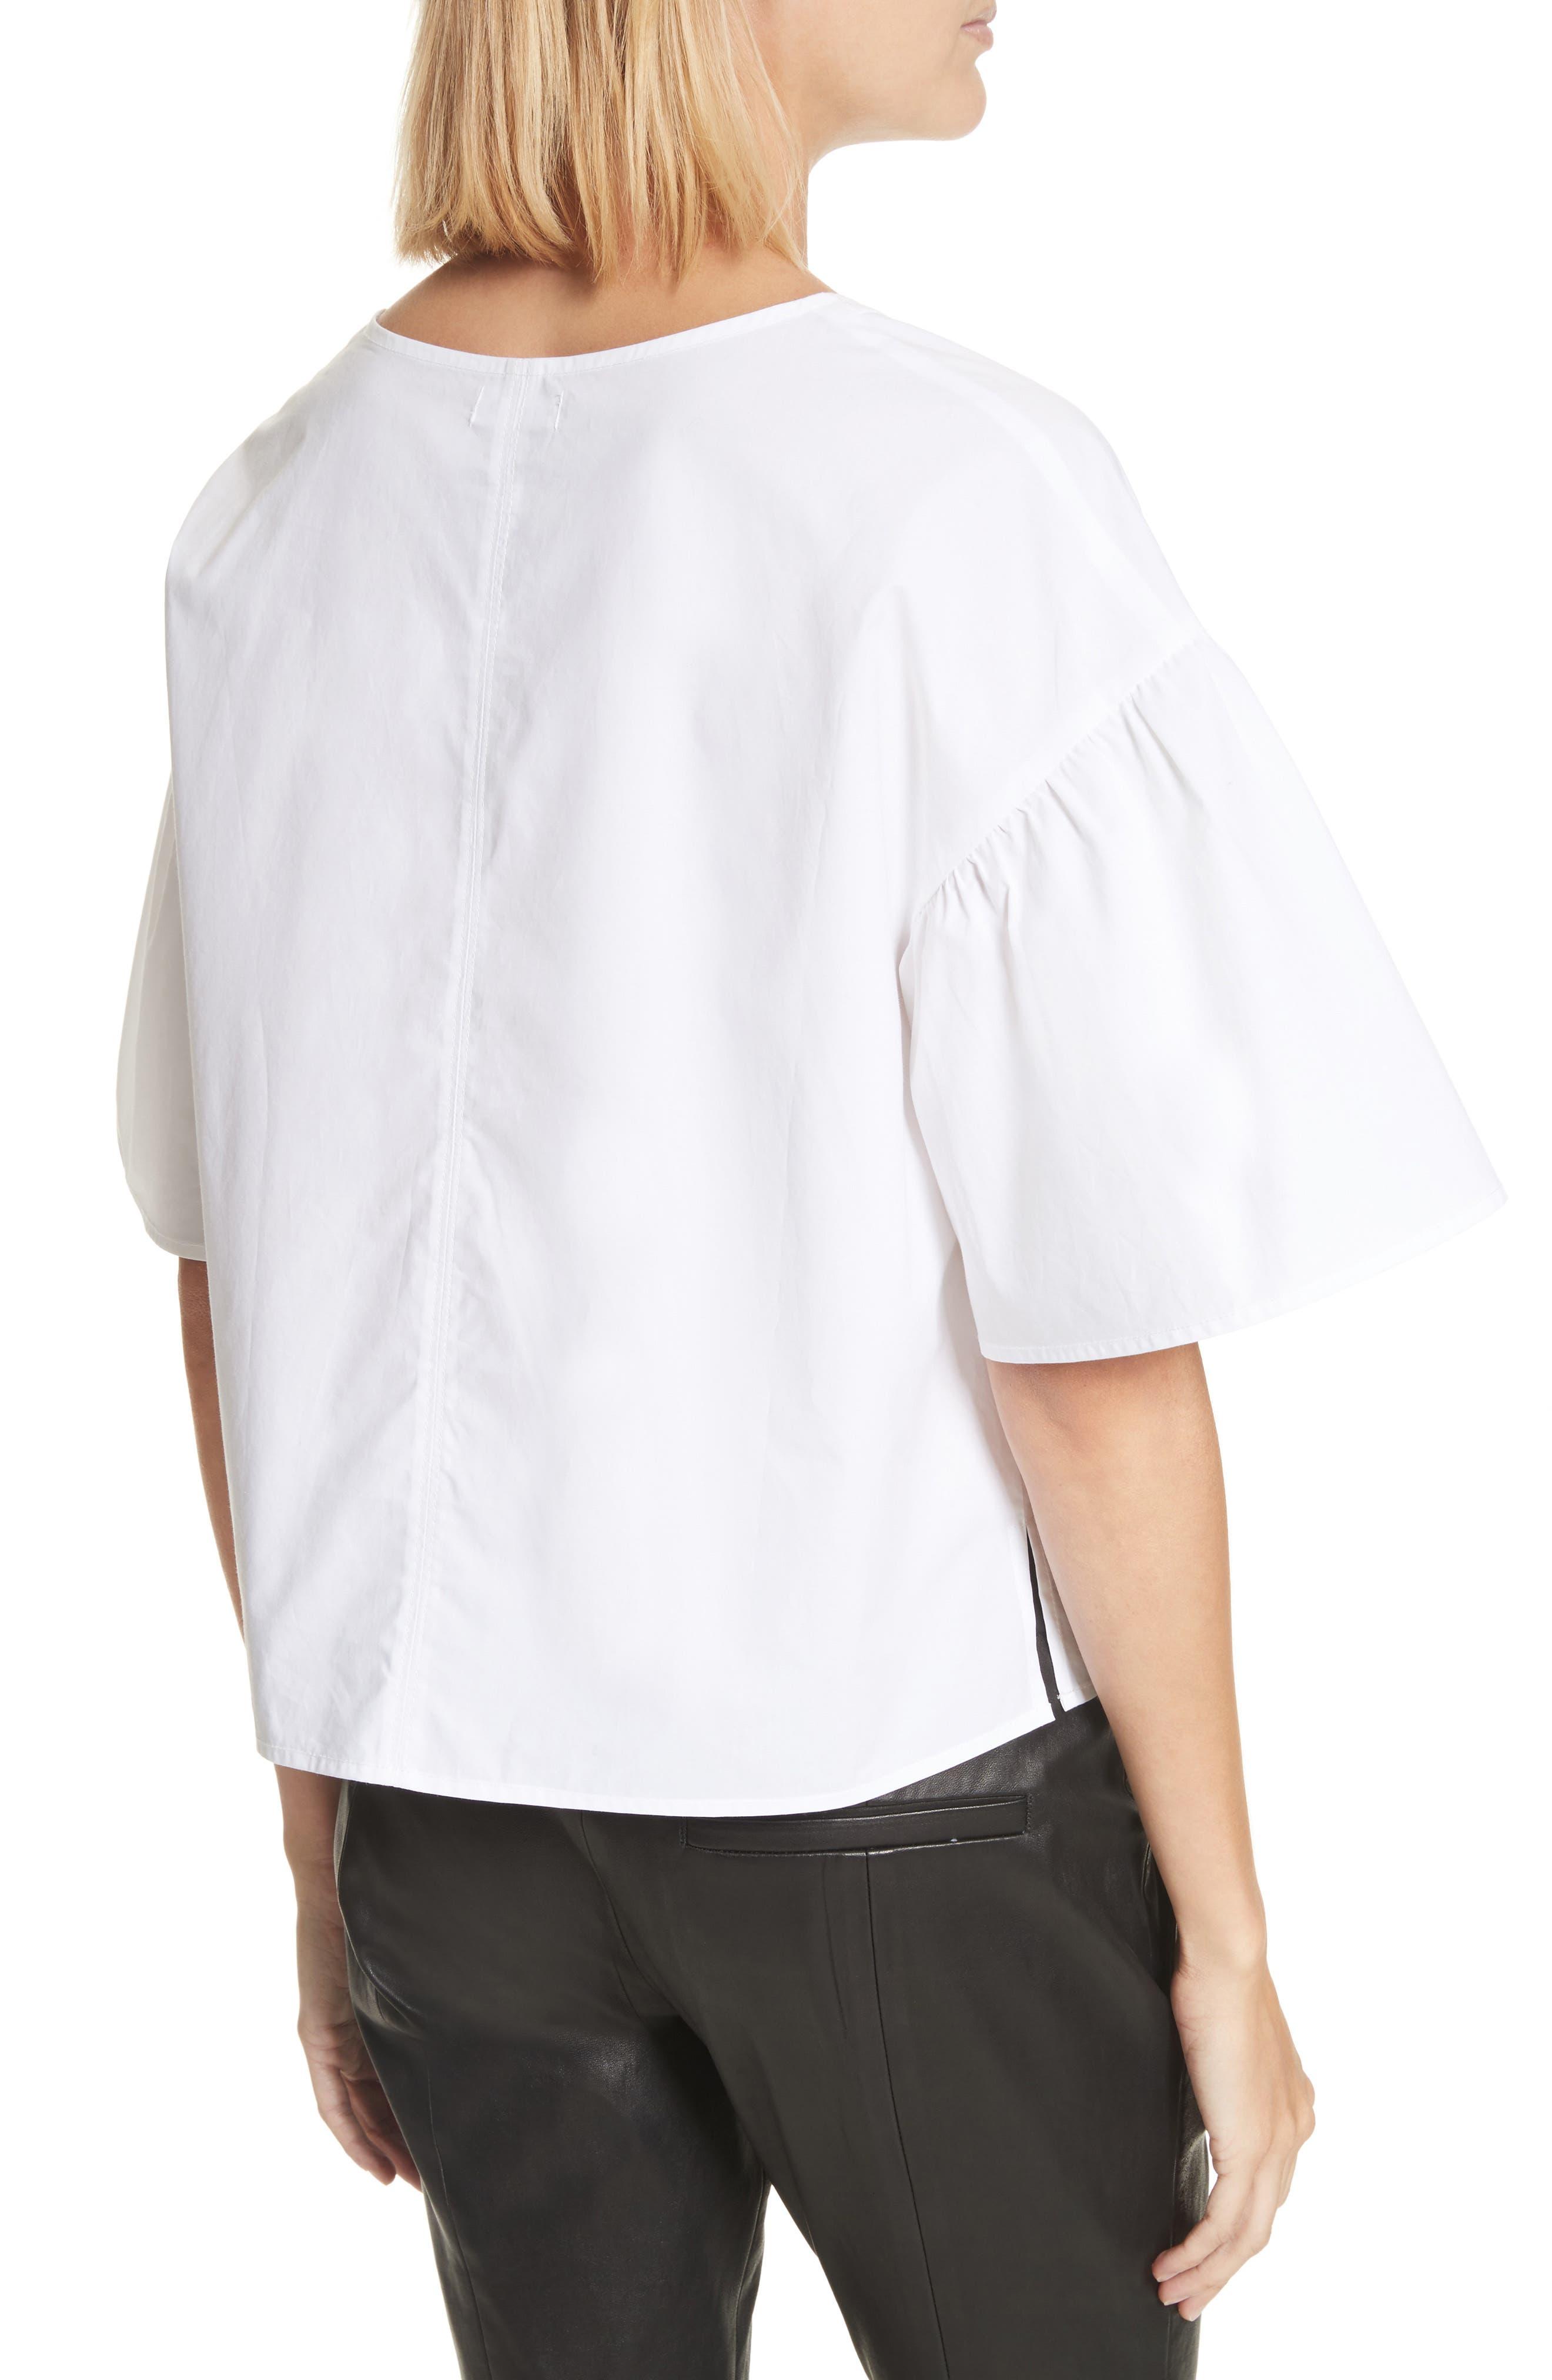 Kyrie Cotton Top,                             Alternate thumbnail 3, color,                             White